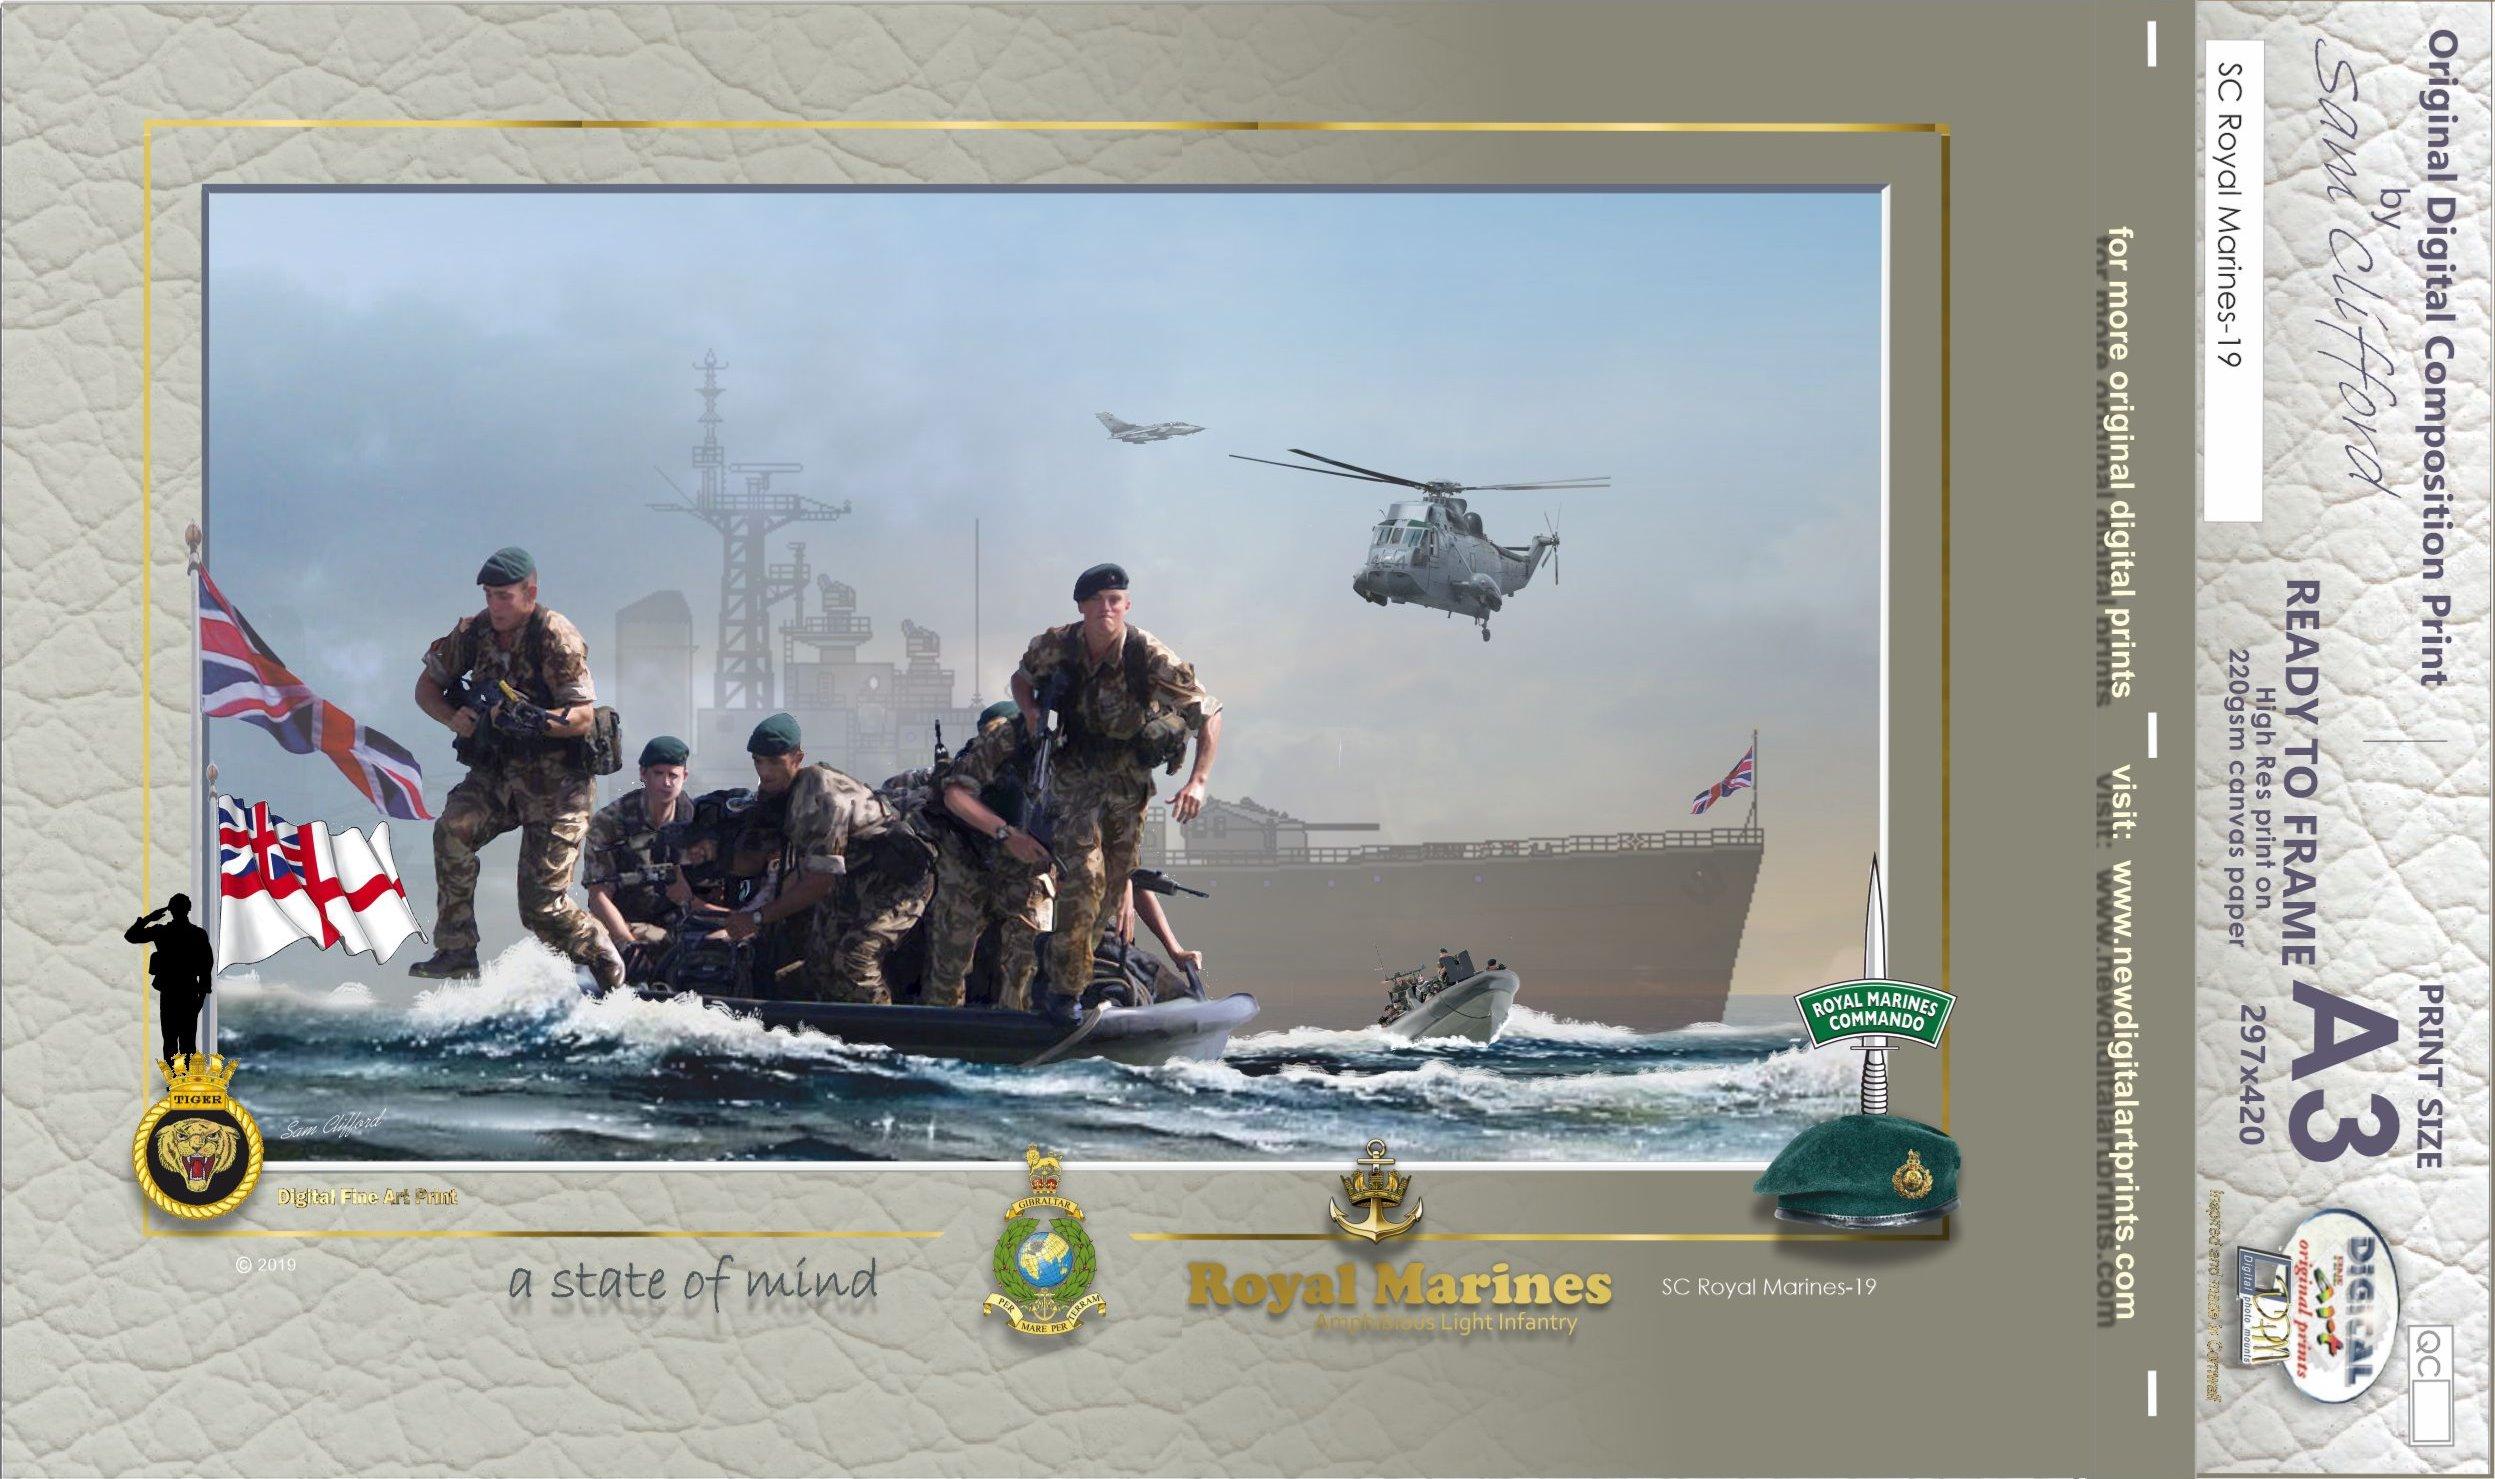 print code: SC Royal Marines-19